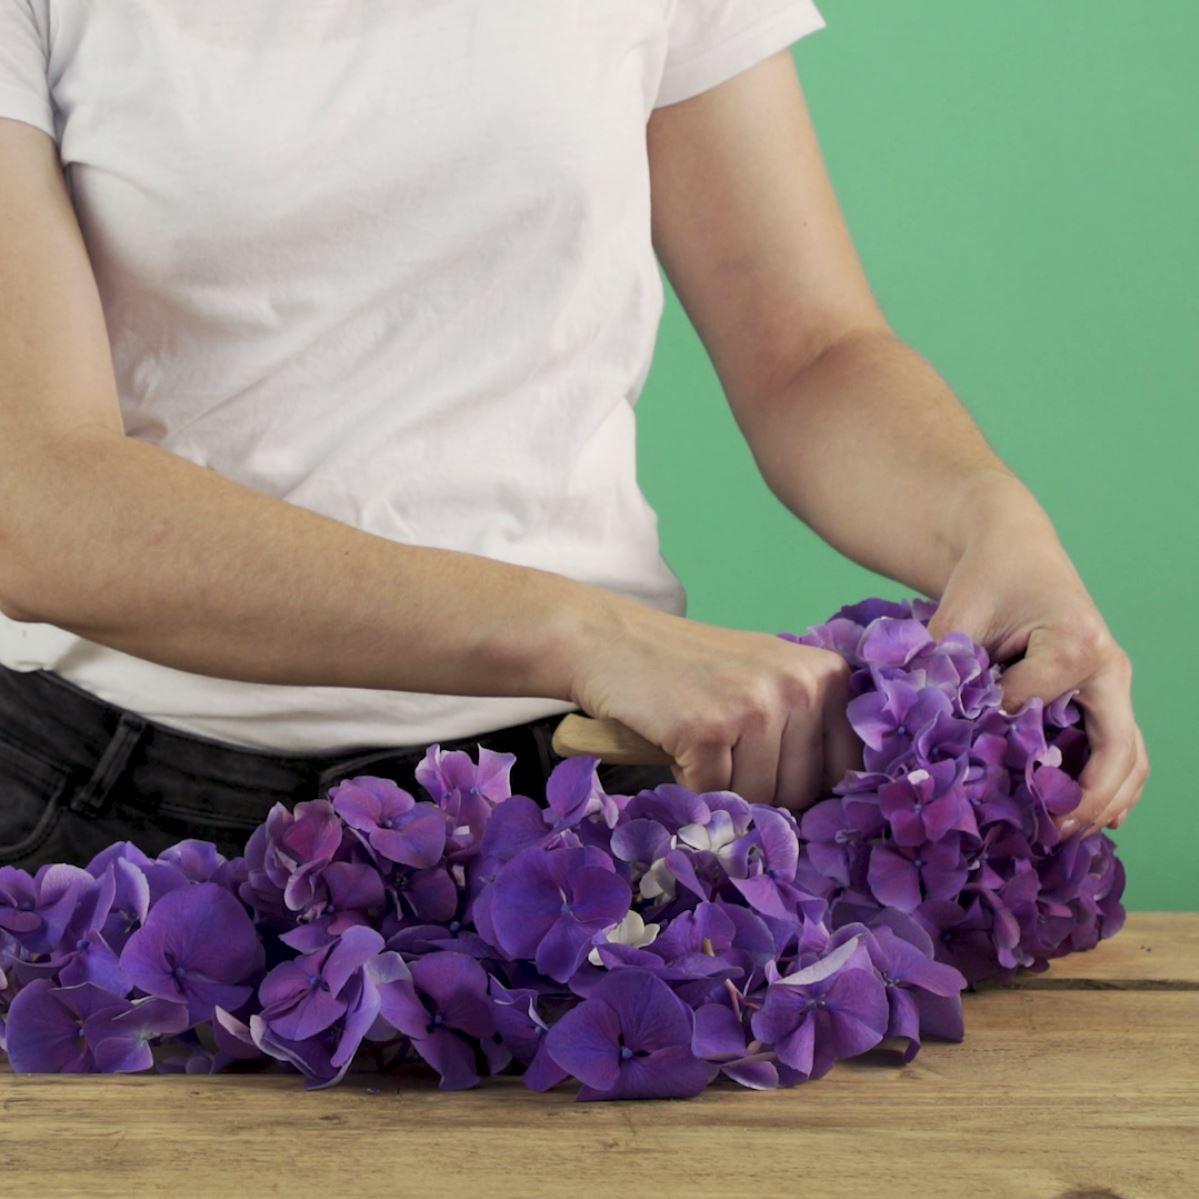 DIY Hortensiakrans stap 1: Hortensia snijden